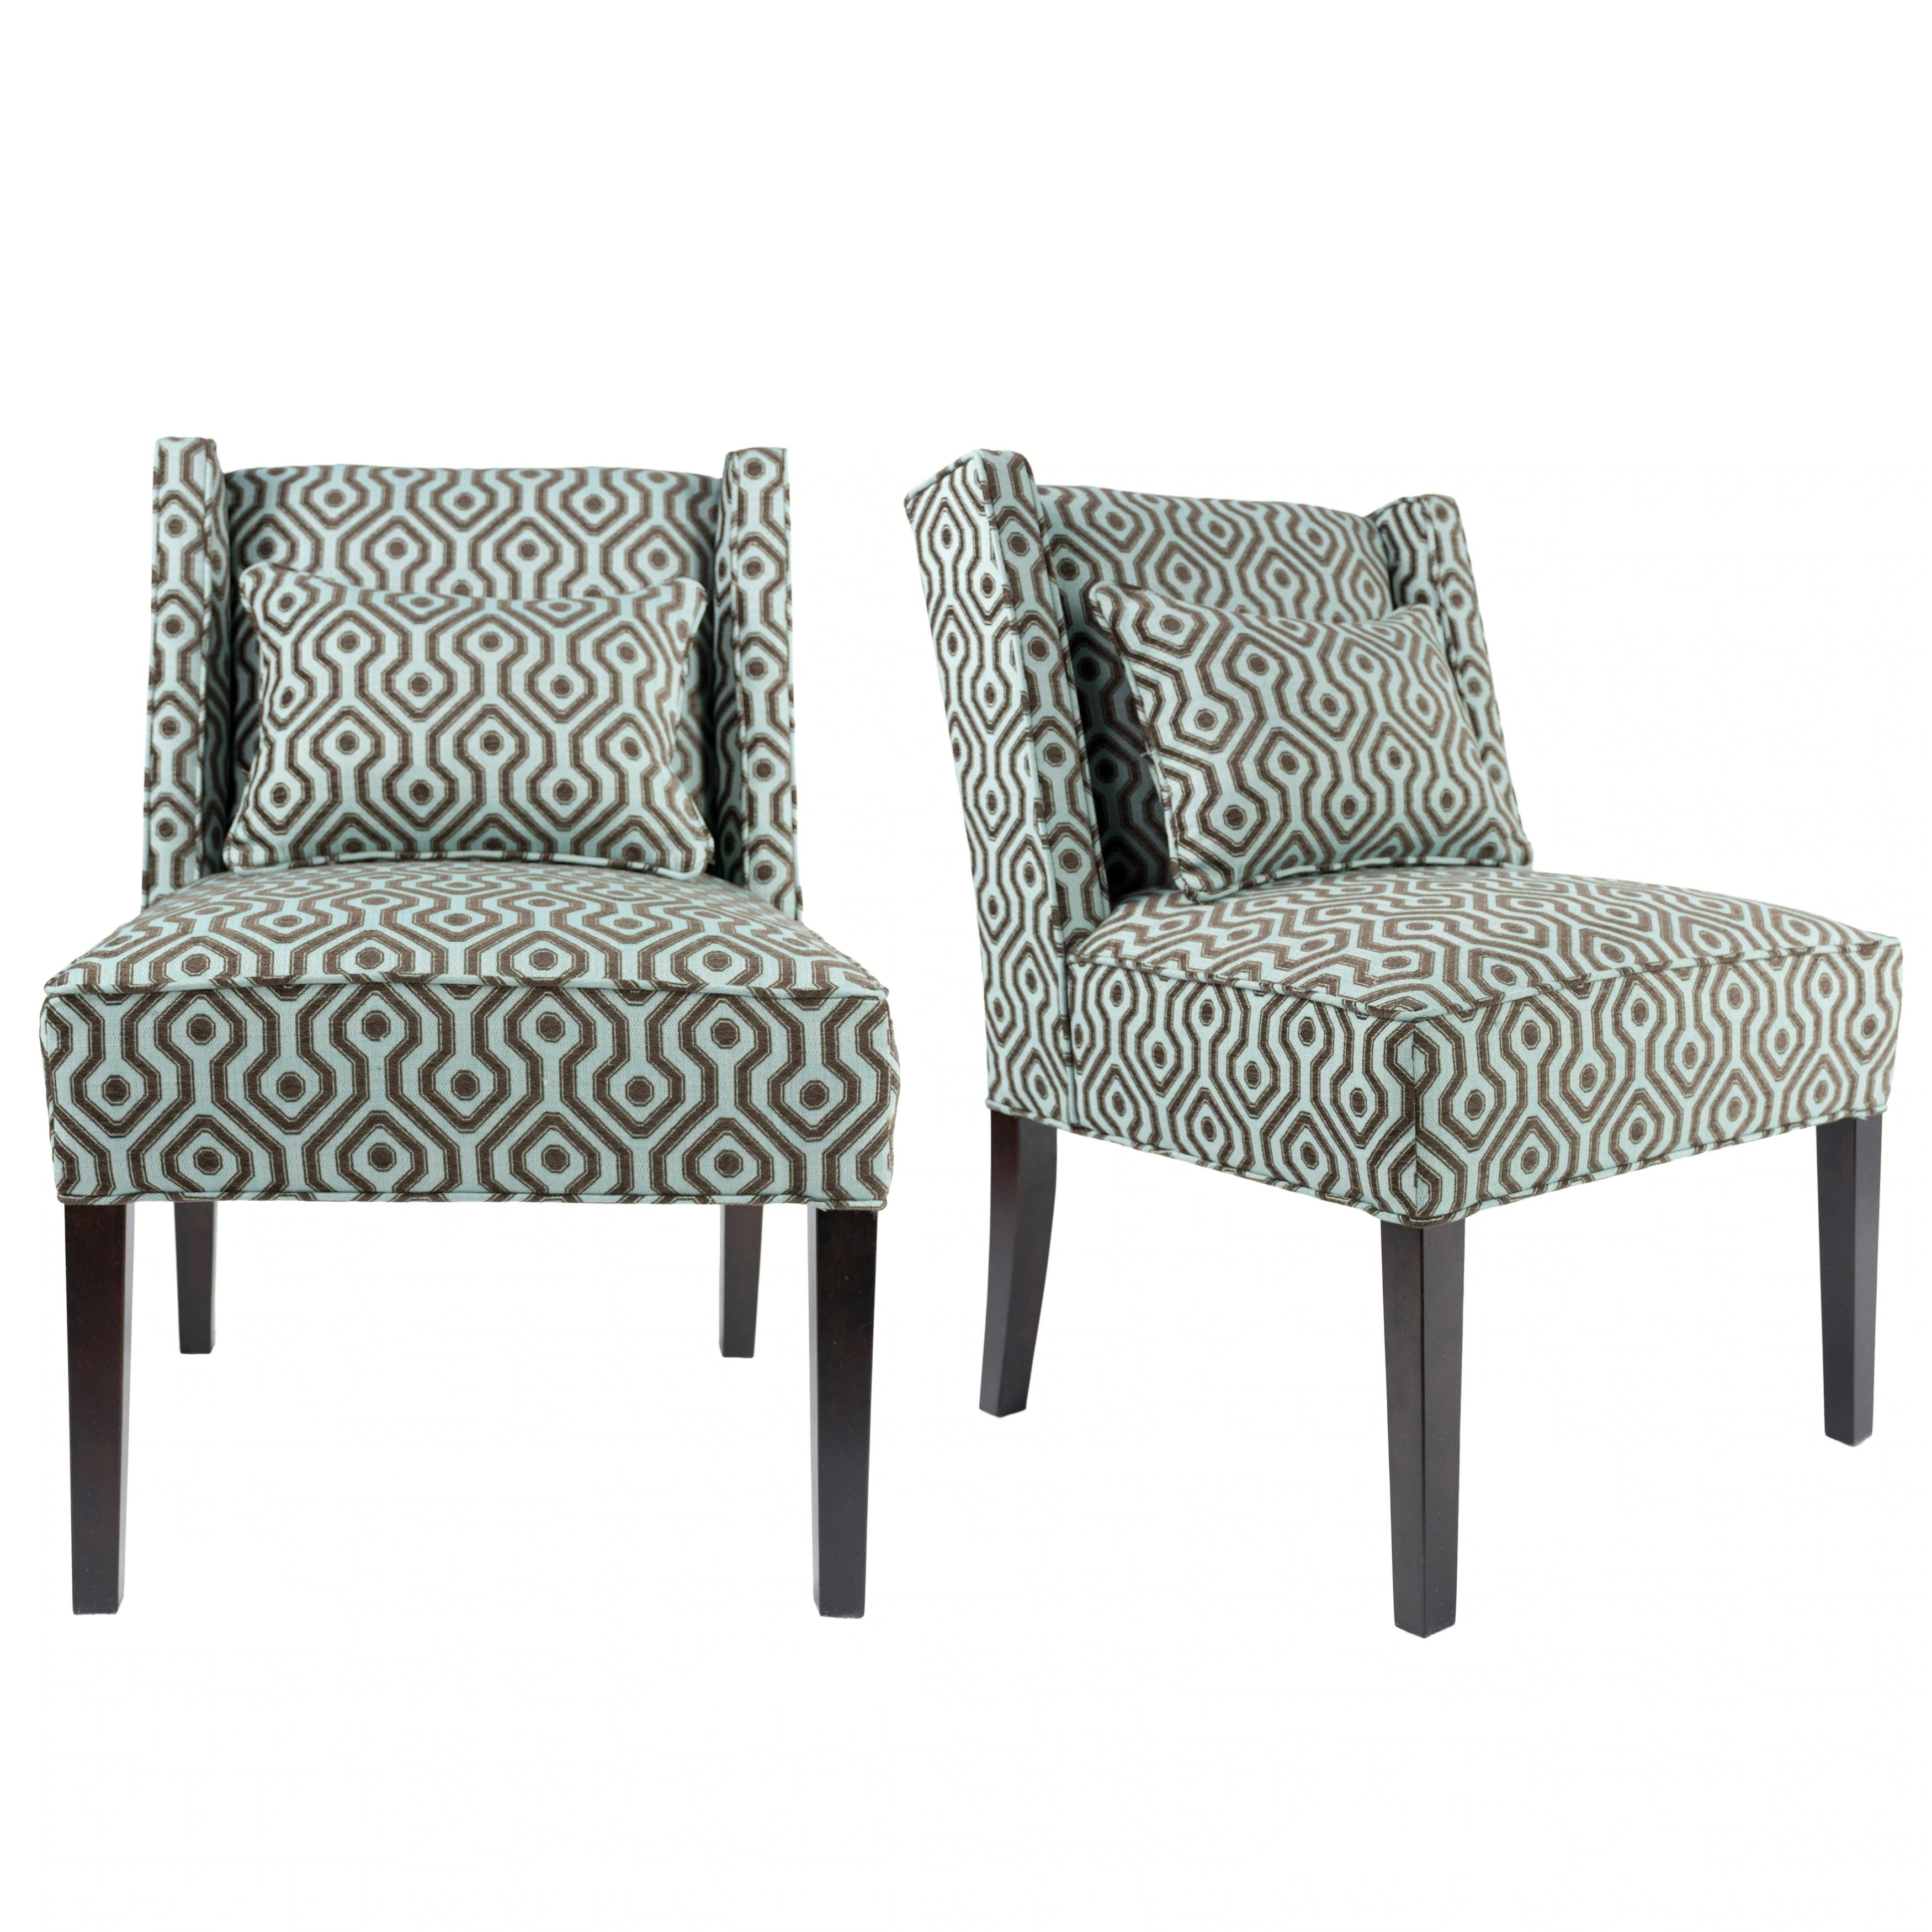 upholstered slipper chair la z boy executive office shop nolani modern fabric bistrole wingback